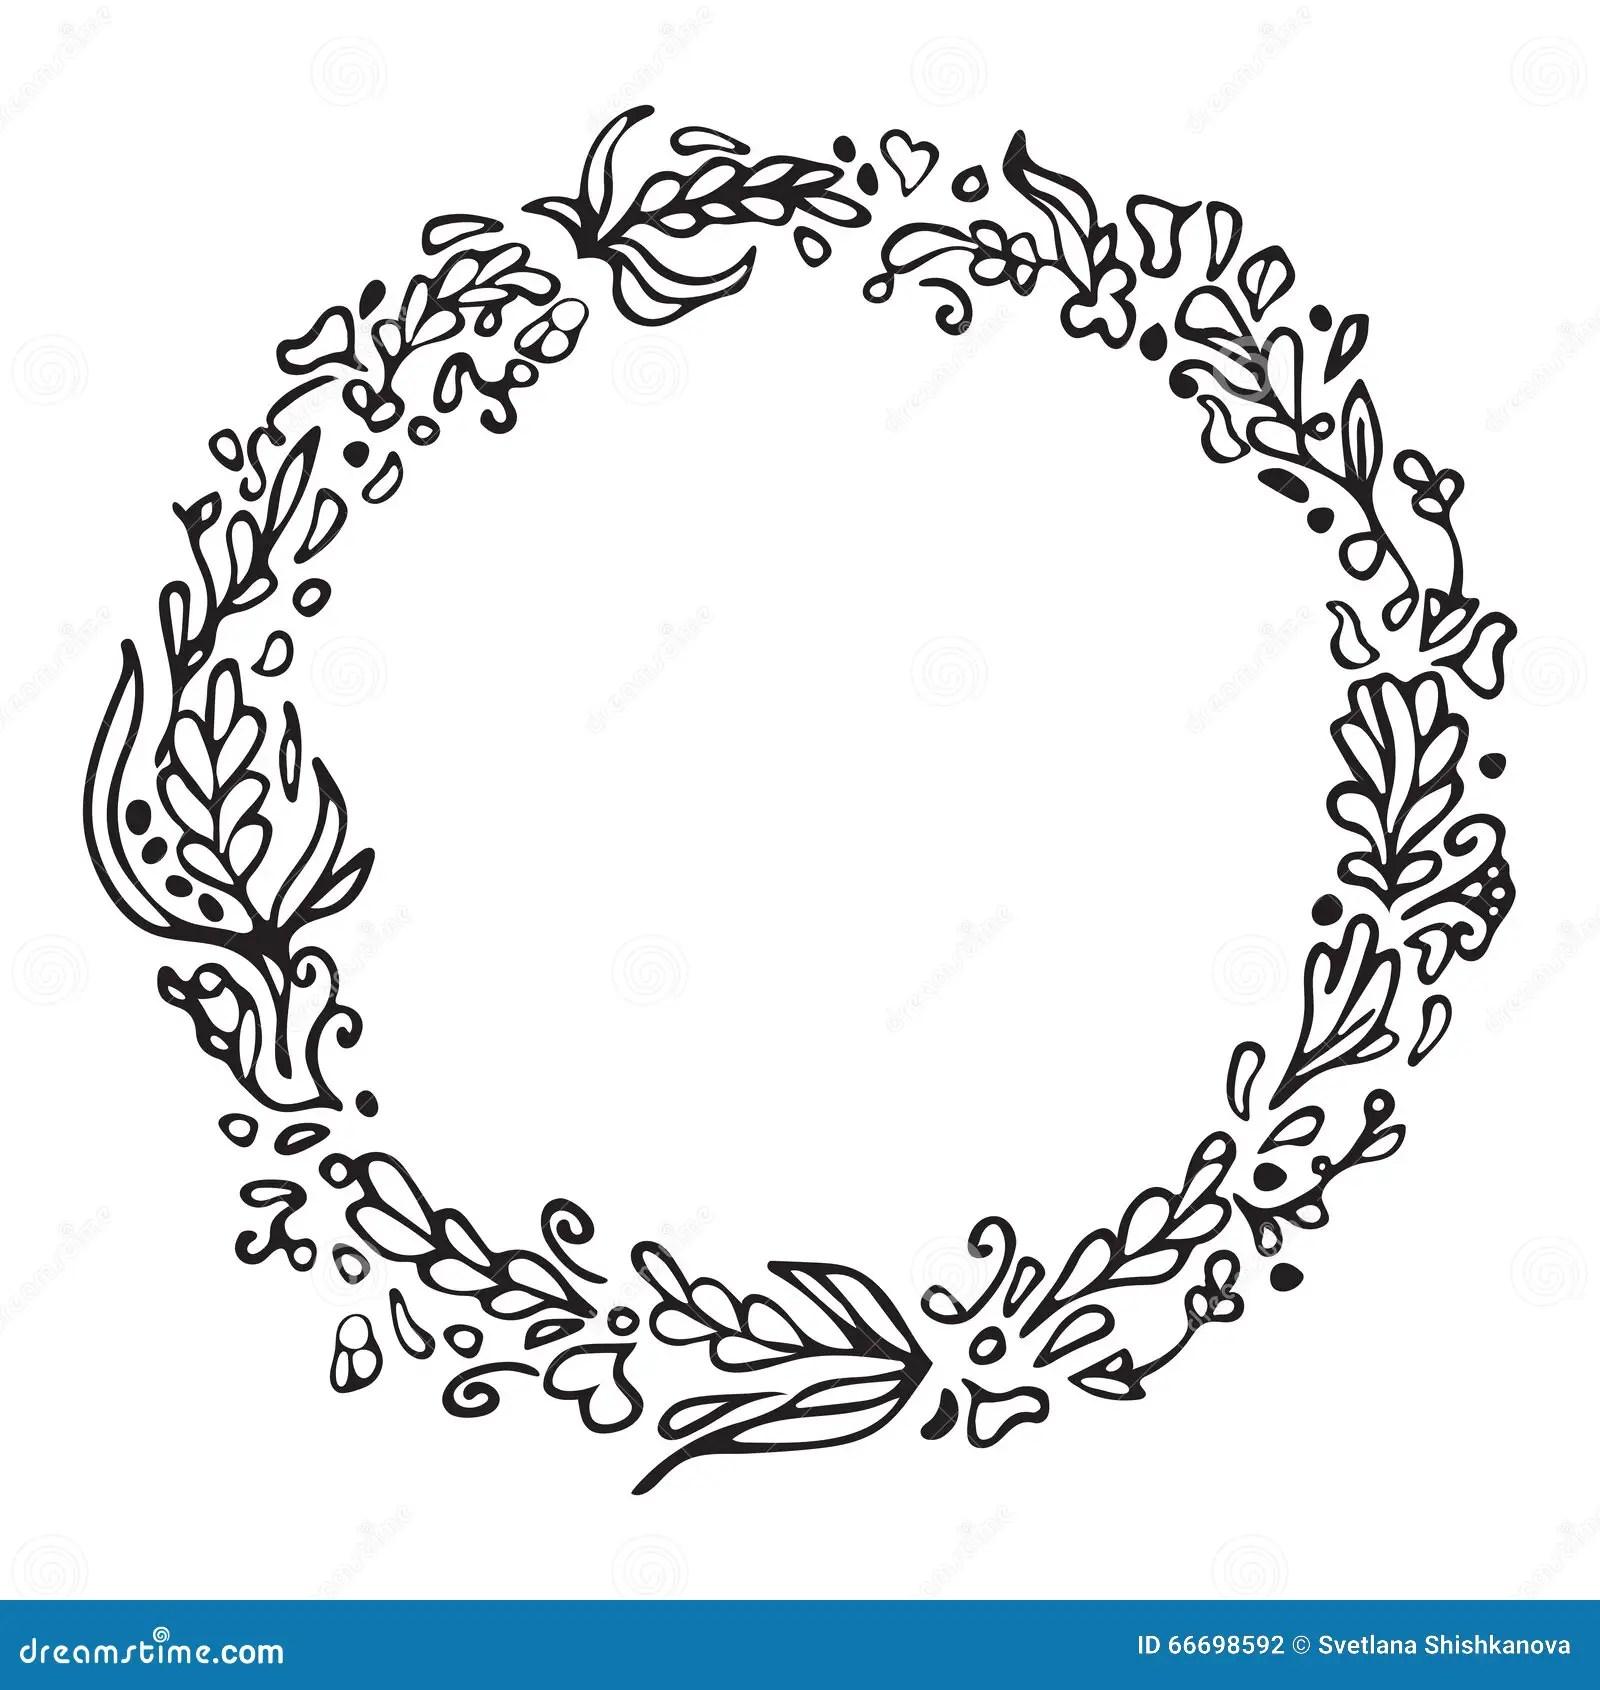 Leaf Doodle Wreath Vintage Round Frame Isolated On White